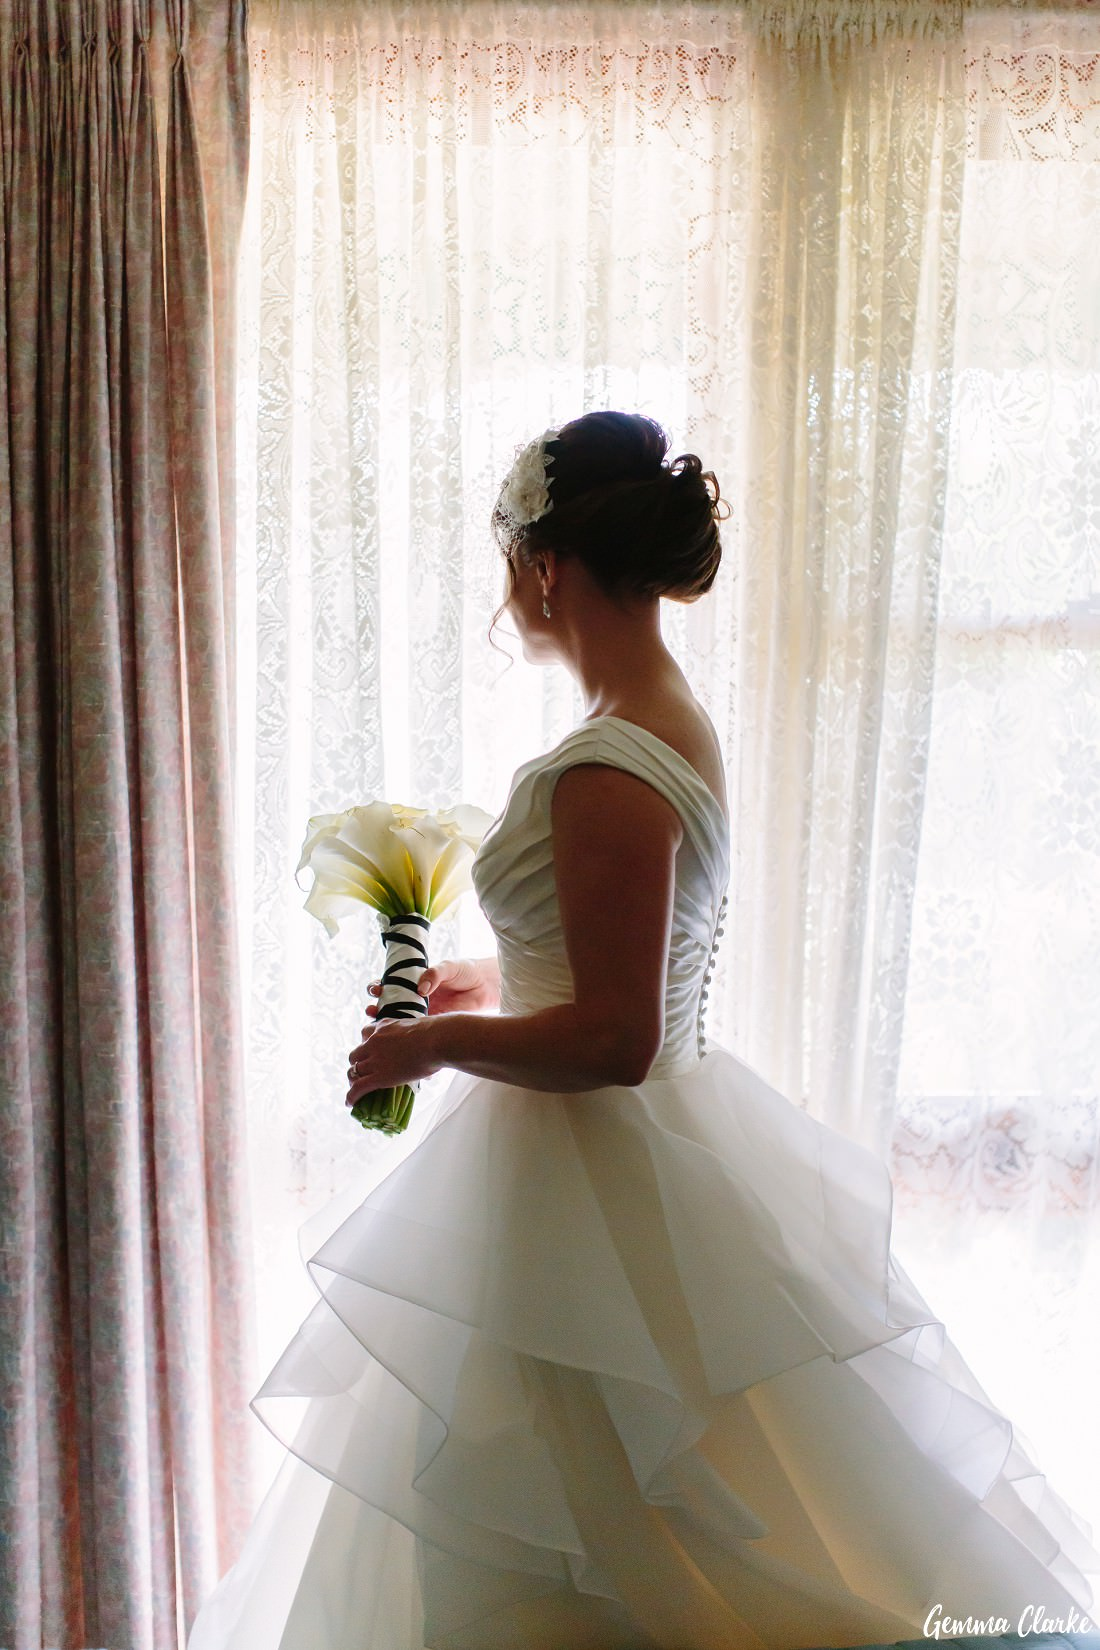 peppertree-ridge-wedding_razorback_gemma-clarke-photography-0017a